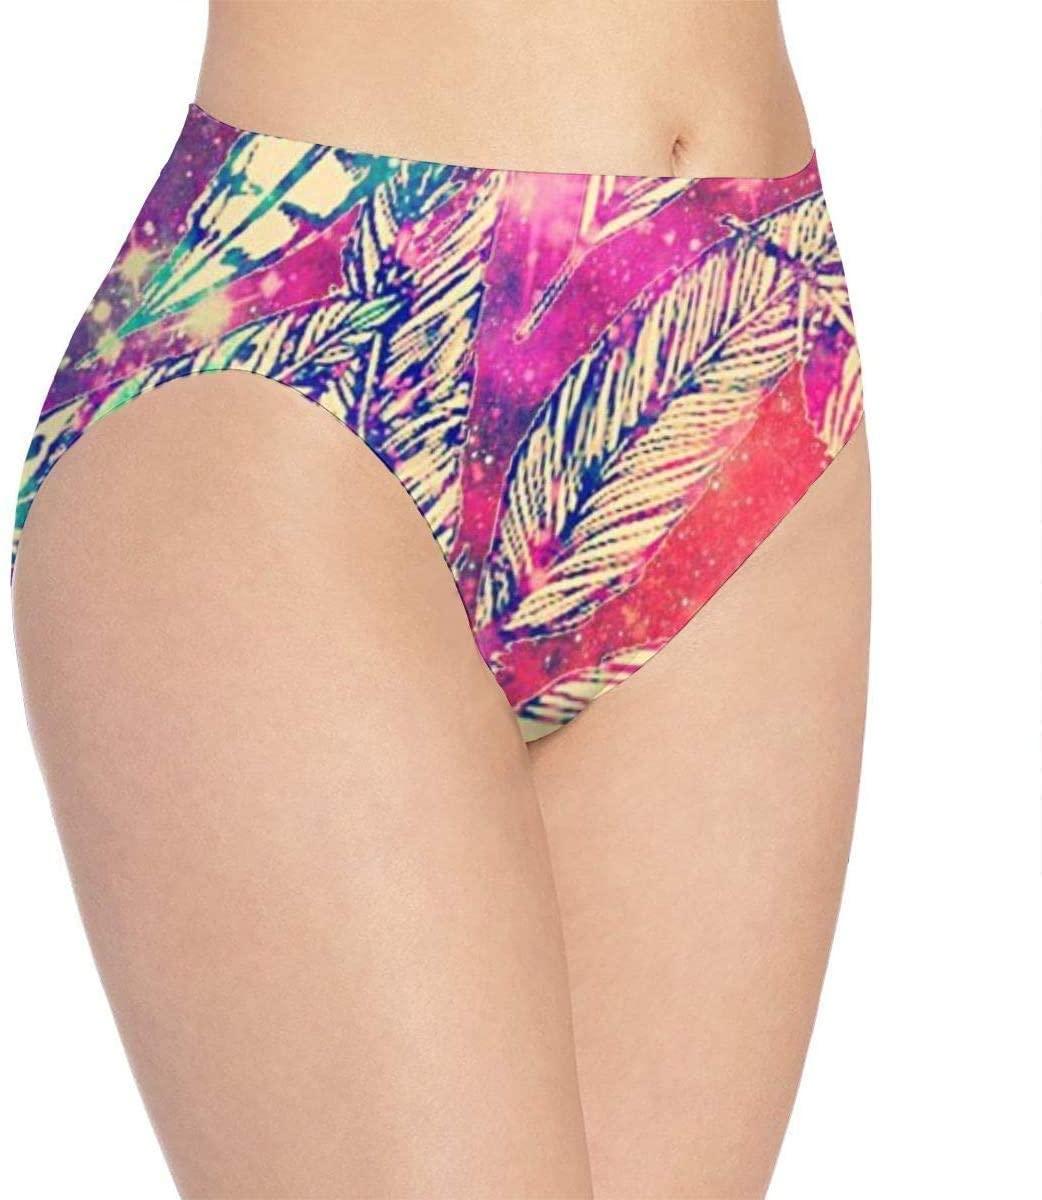 Falling Feathers Women's Briefs Underwear Printed Pattern Shorts